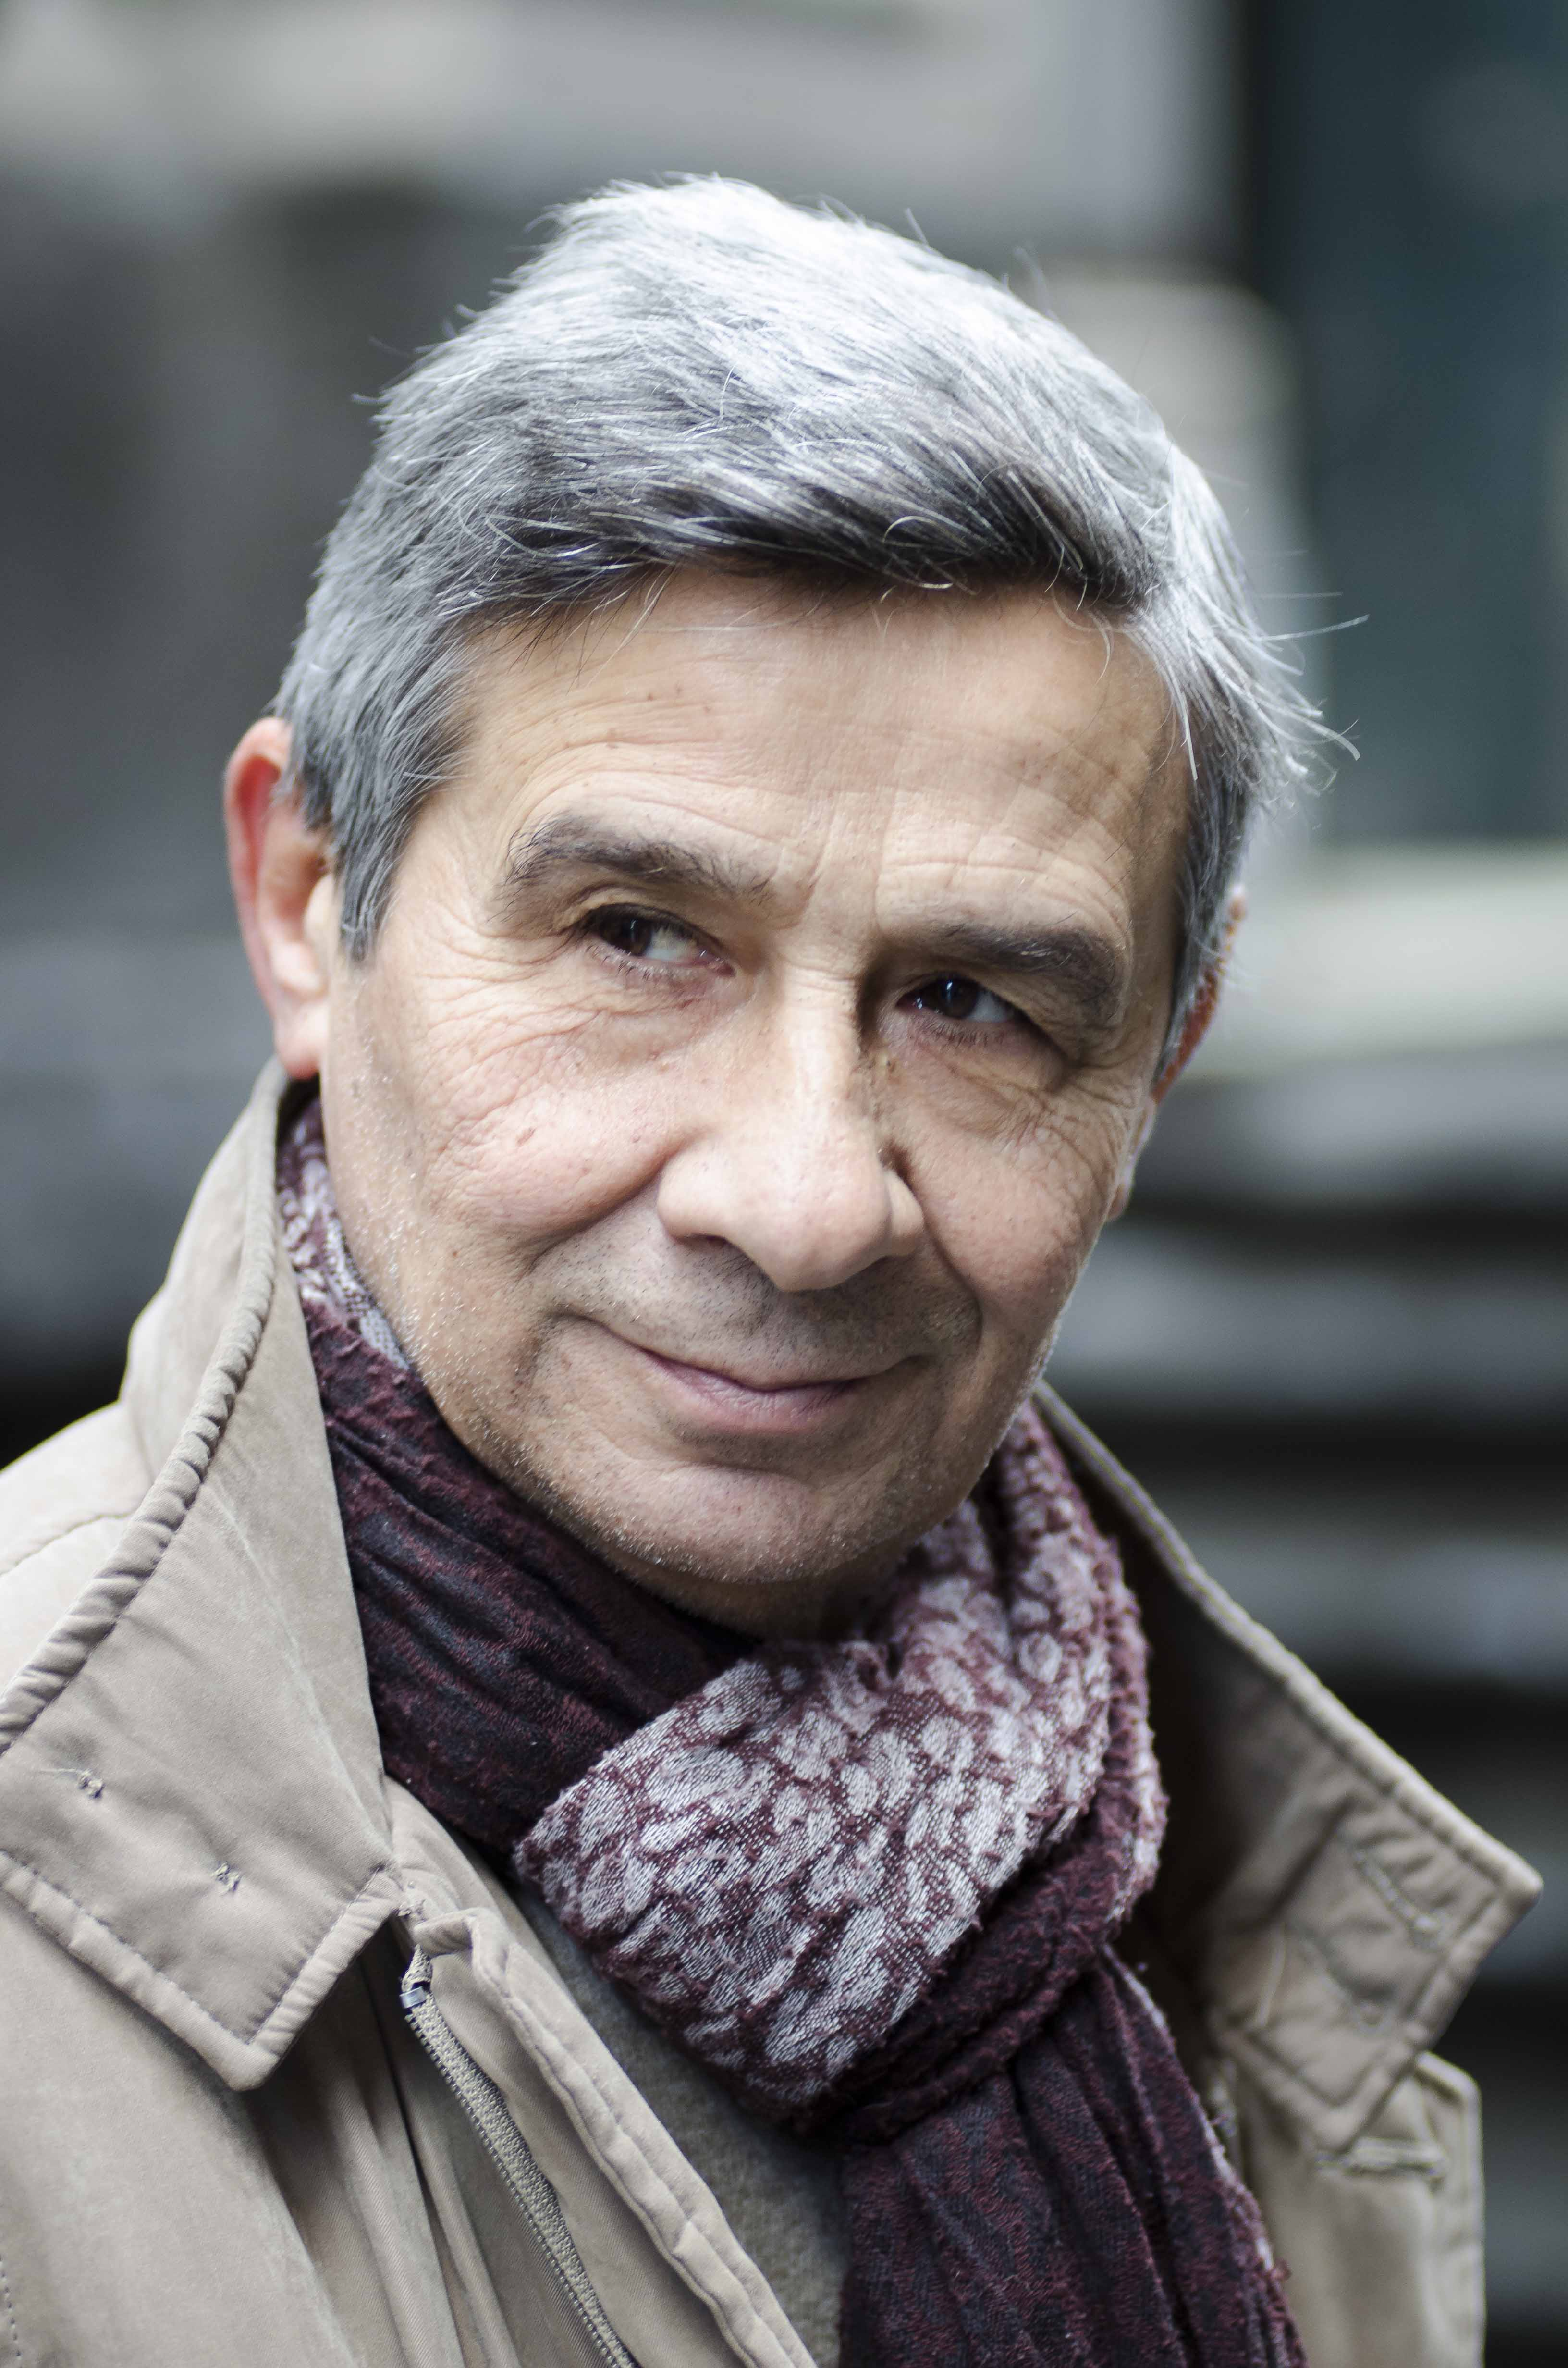 Antonio #8